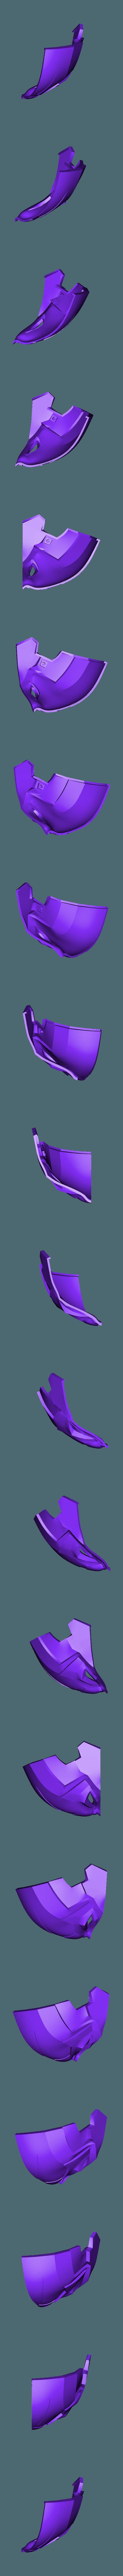 Red X Part 2.stl Download STL file Deathstroke Injustice Helmet • 3D printable model, VillainousPropShop